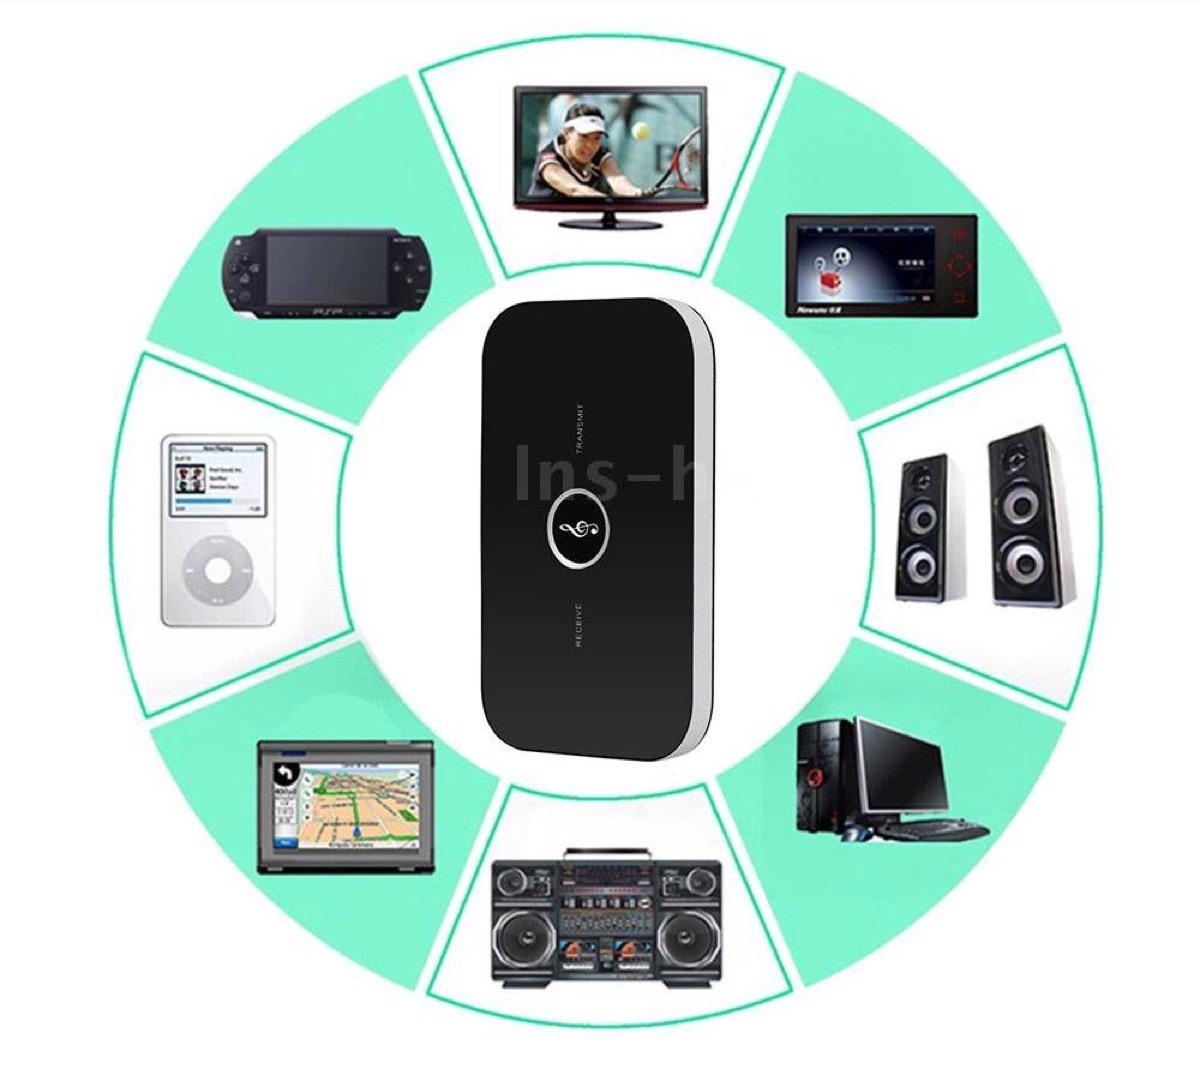 Cuffie per gaming, auricolari wireless, ripetitori Wi-Fi e Bluetooth: sia parte da soli 12€